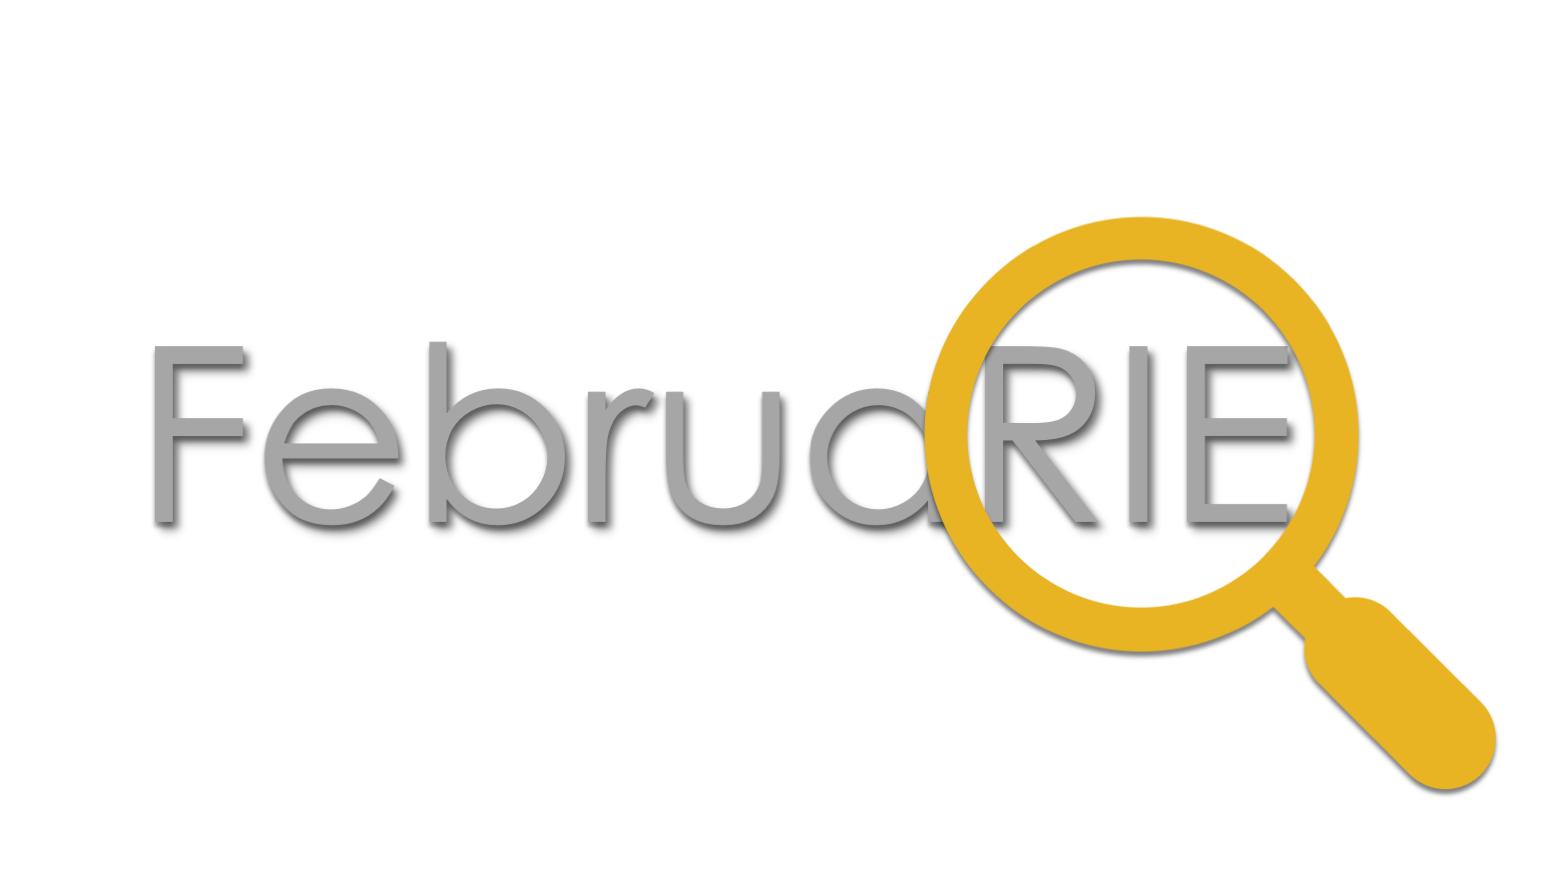 Februari FebruaRIE 15 % Korting op de RI&E